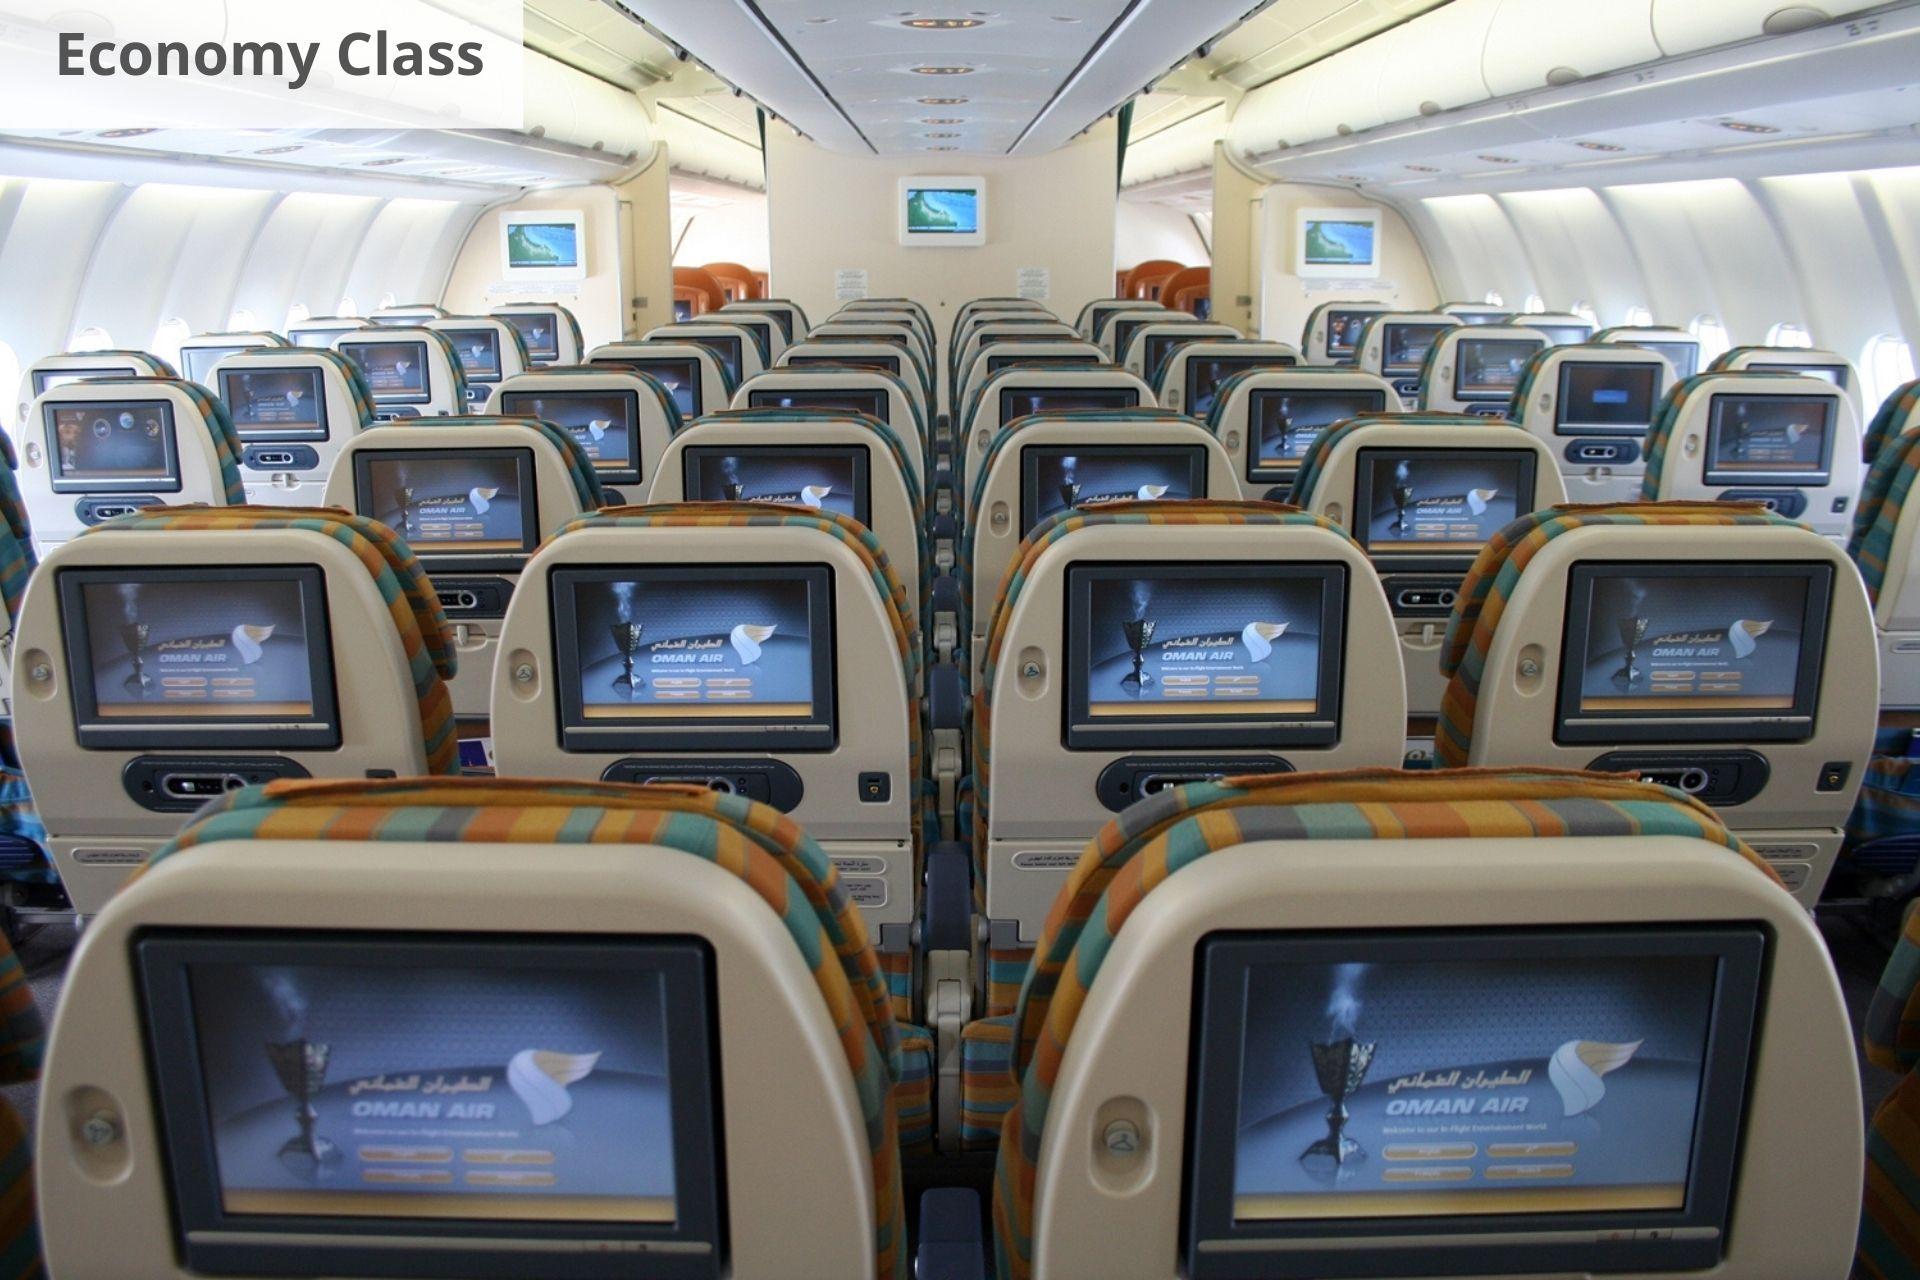 Oman Air economy